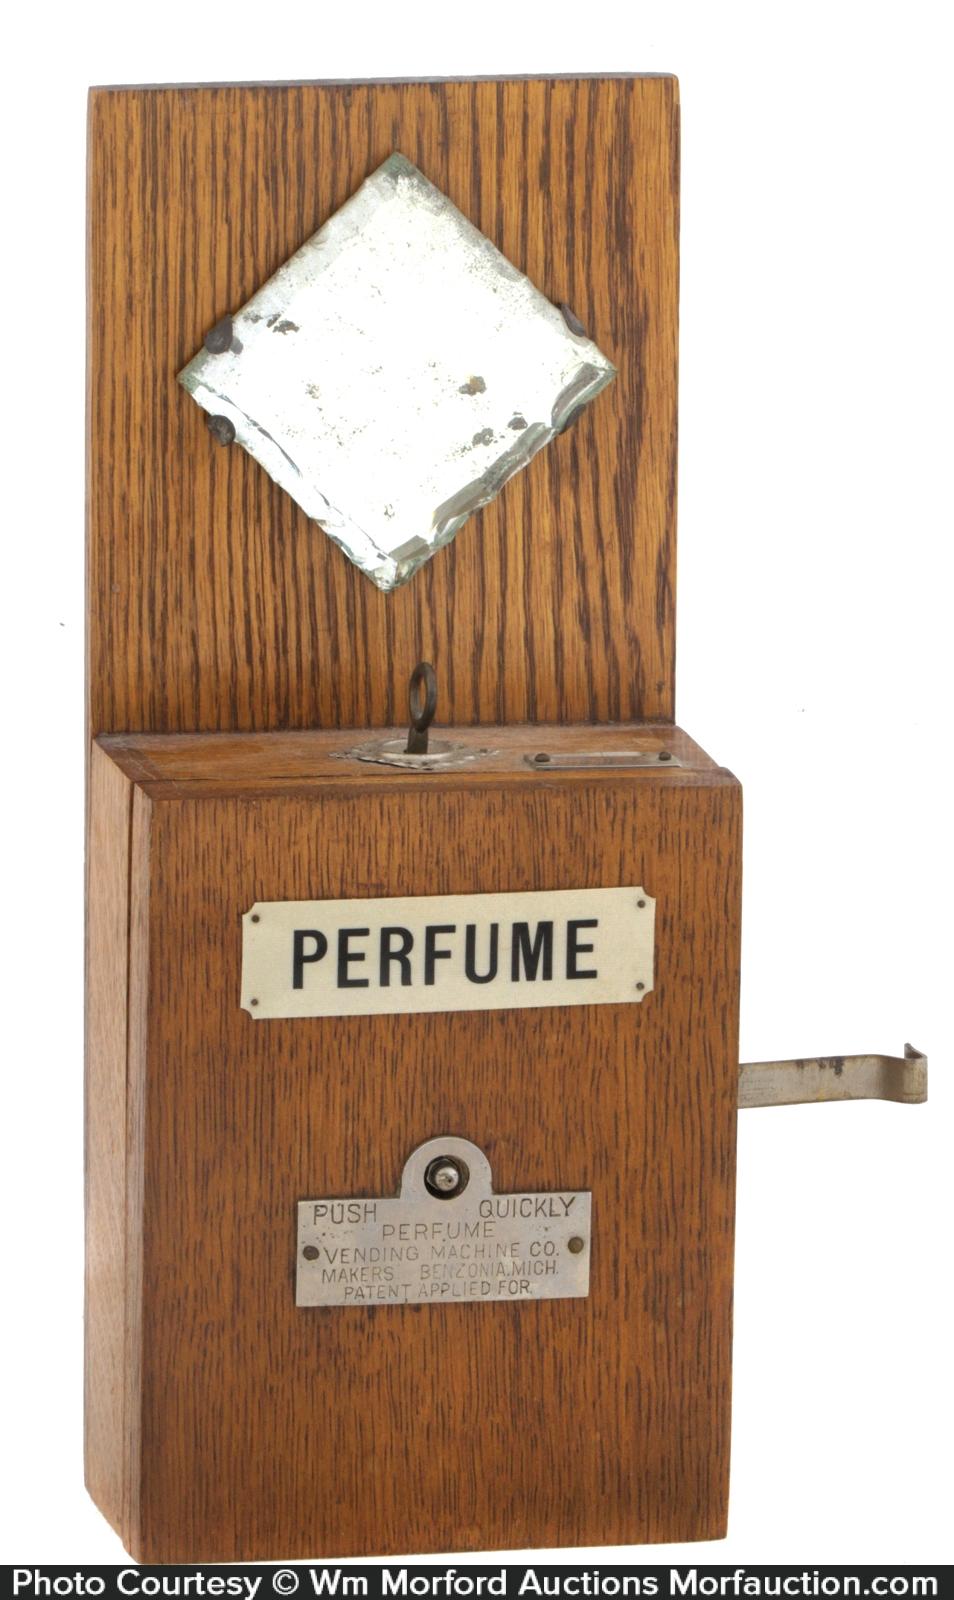 Perfume Vendor